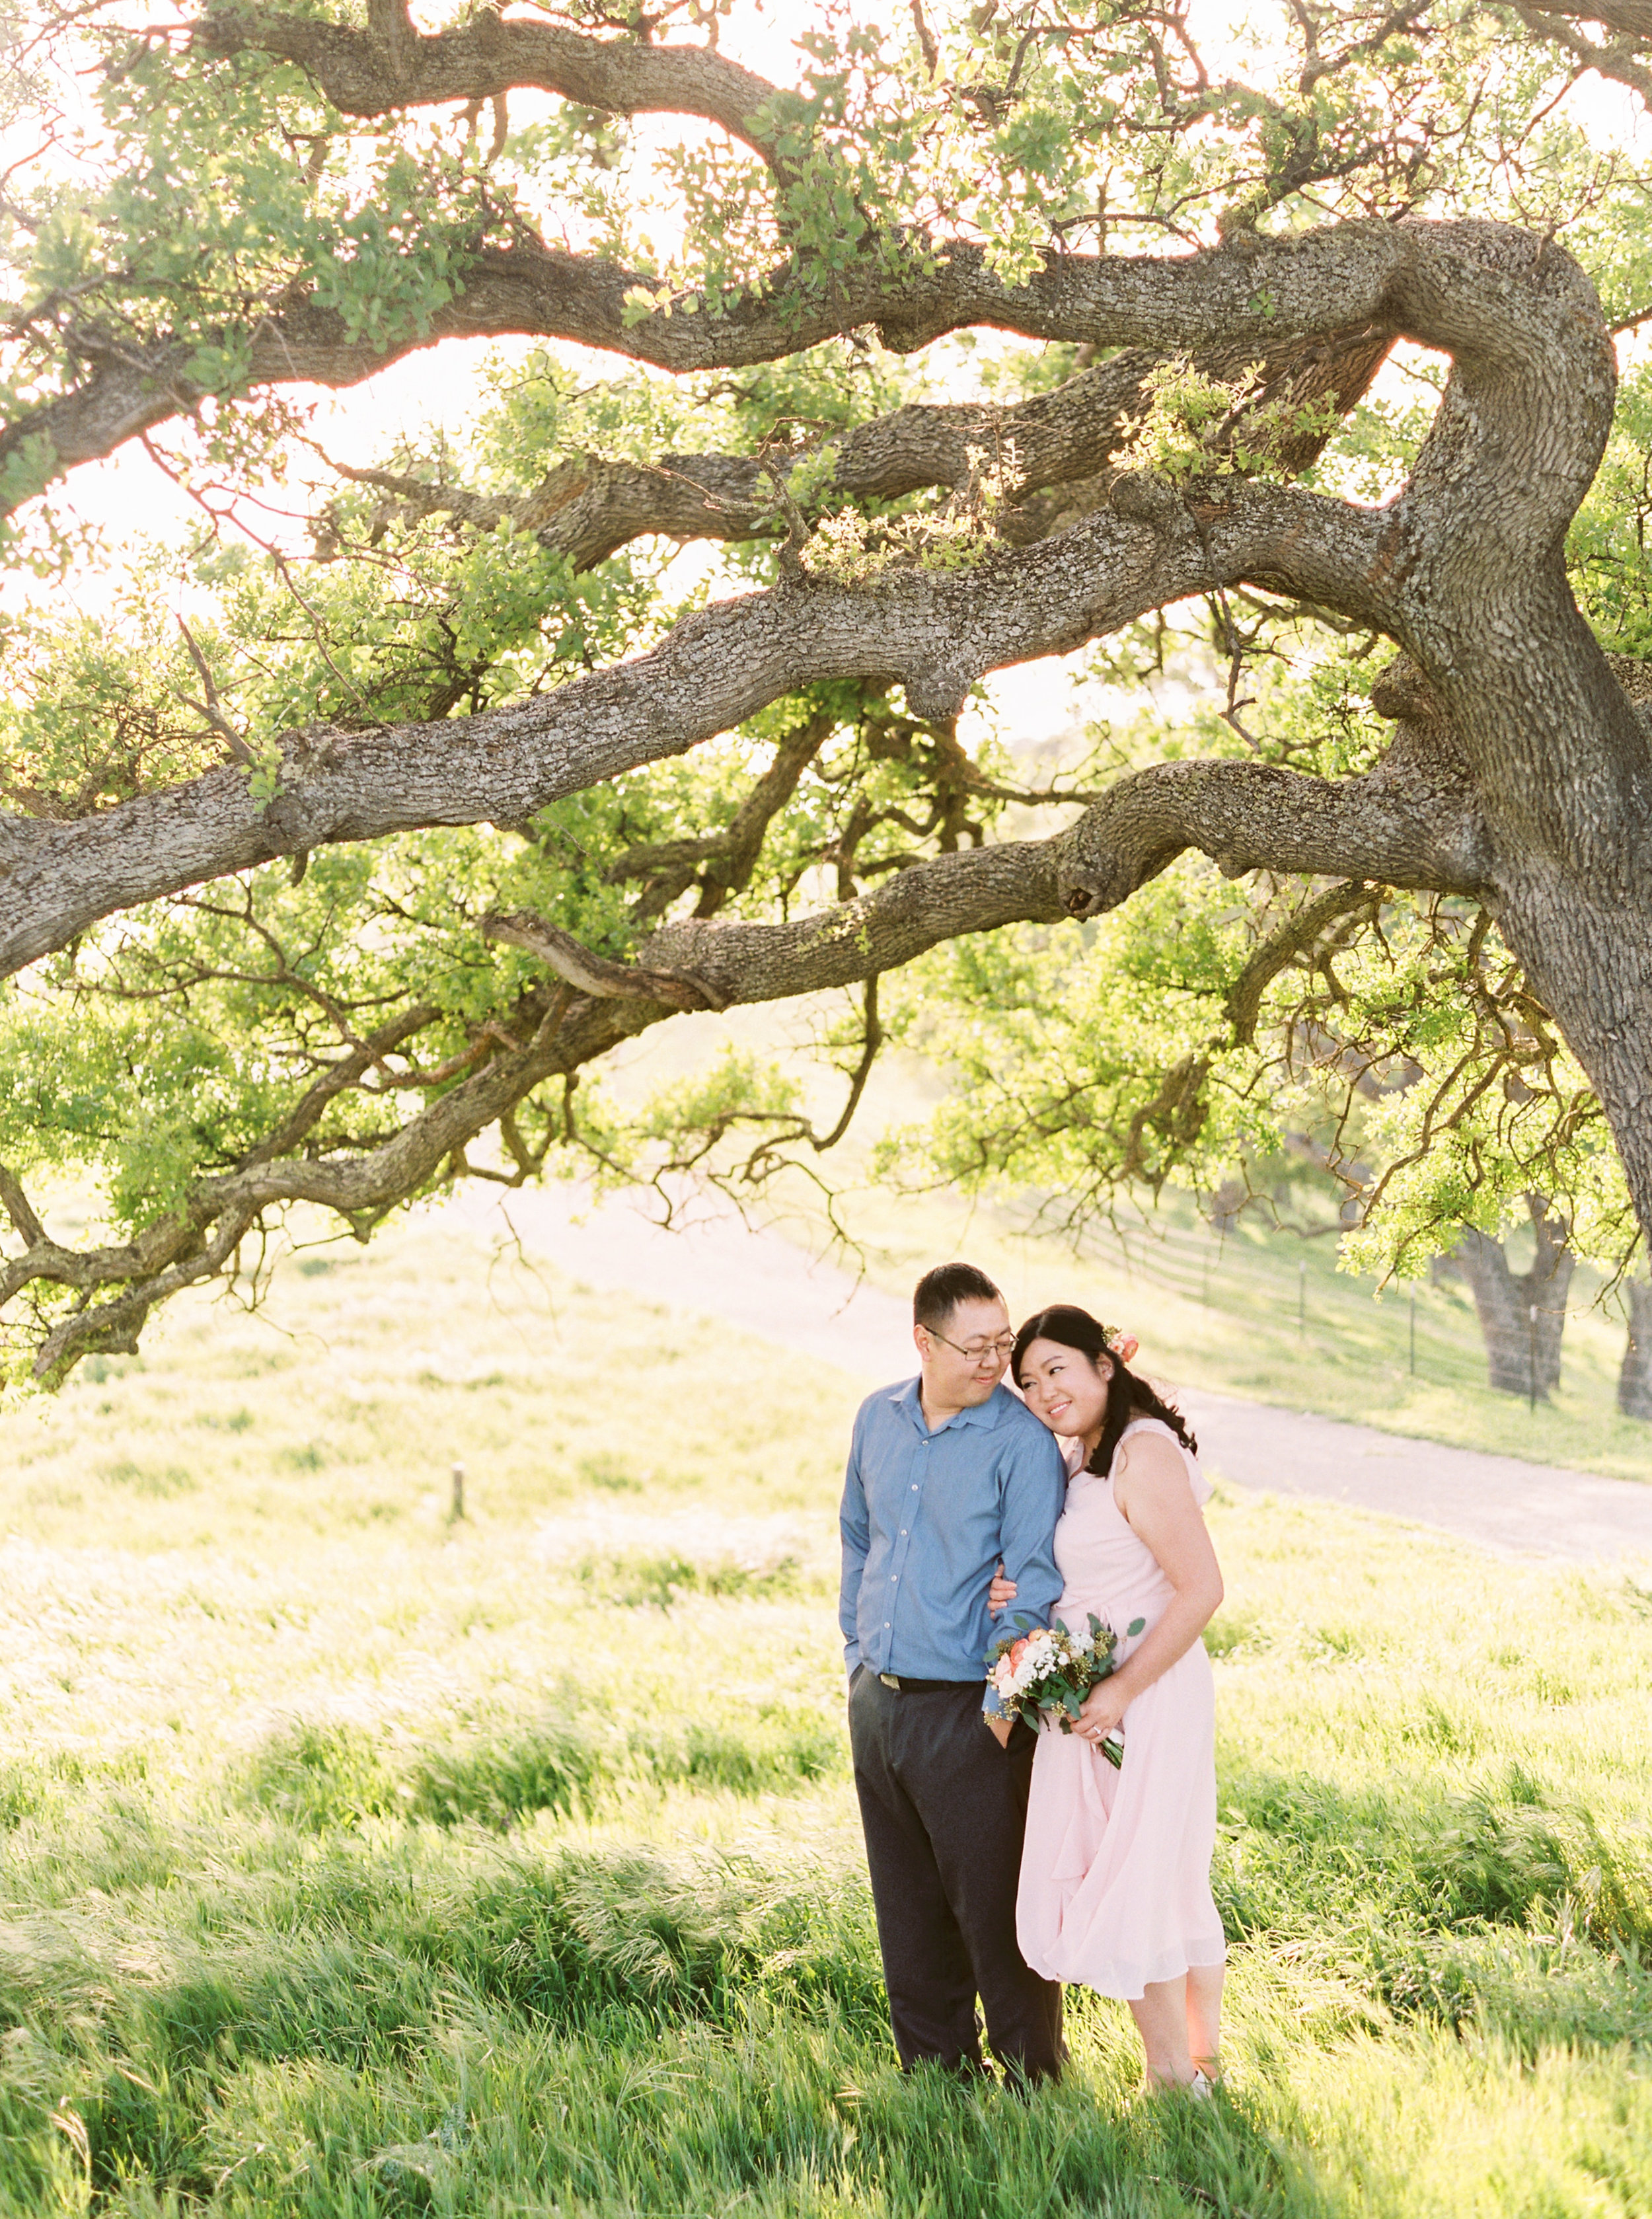 del-valle-livermore-bay-area-wedding-photographer-67.jpg